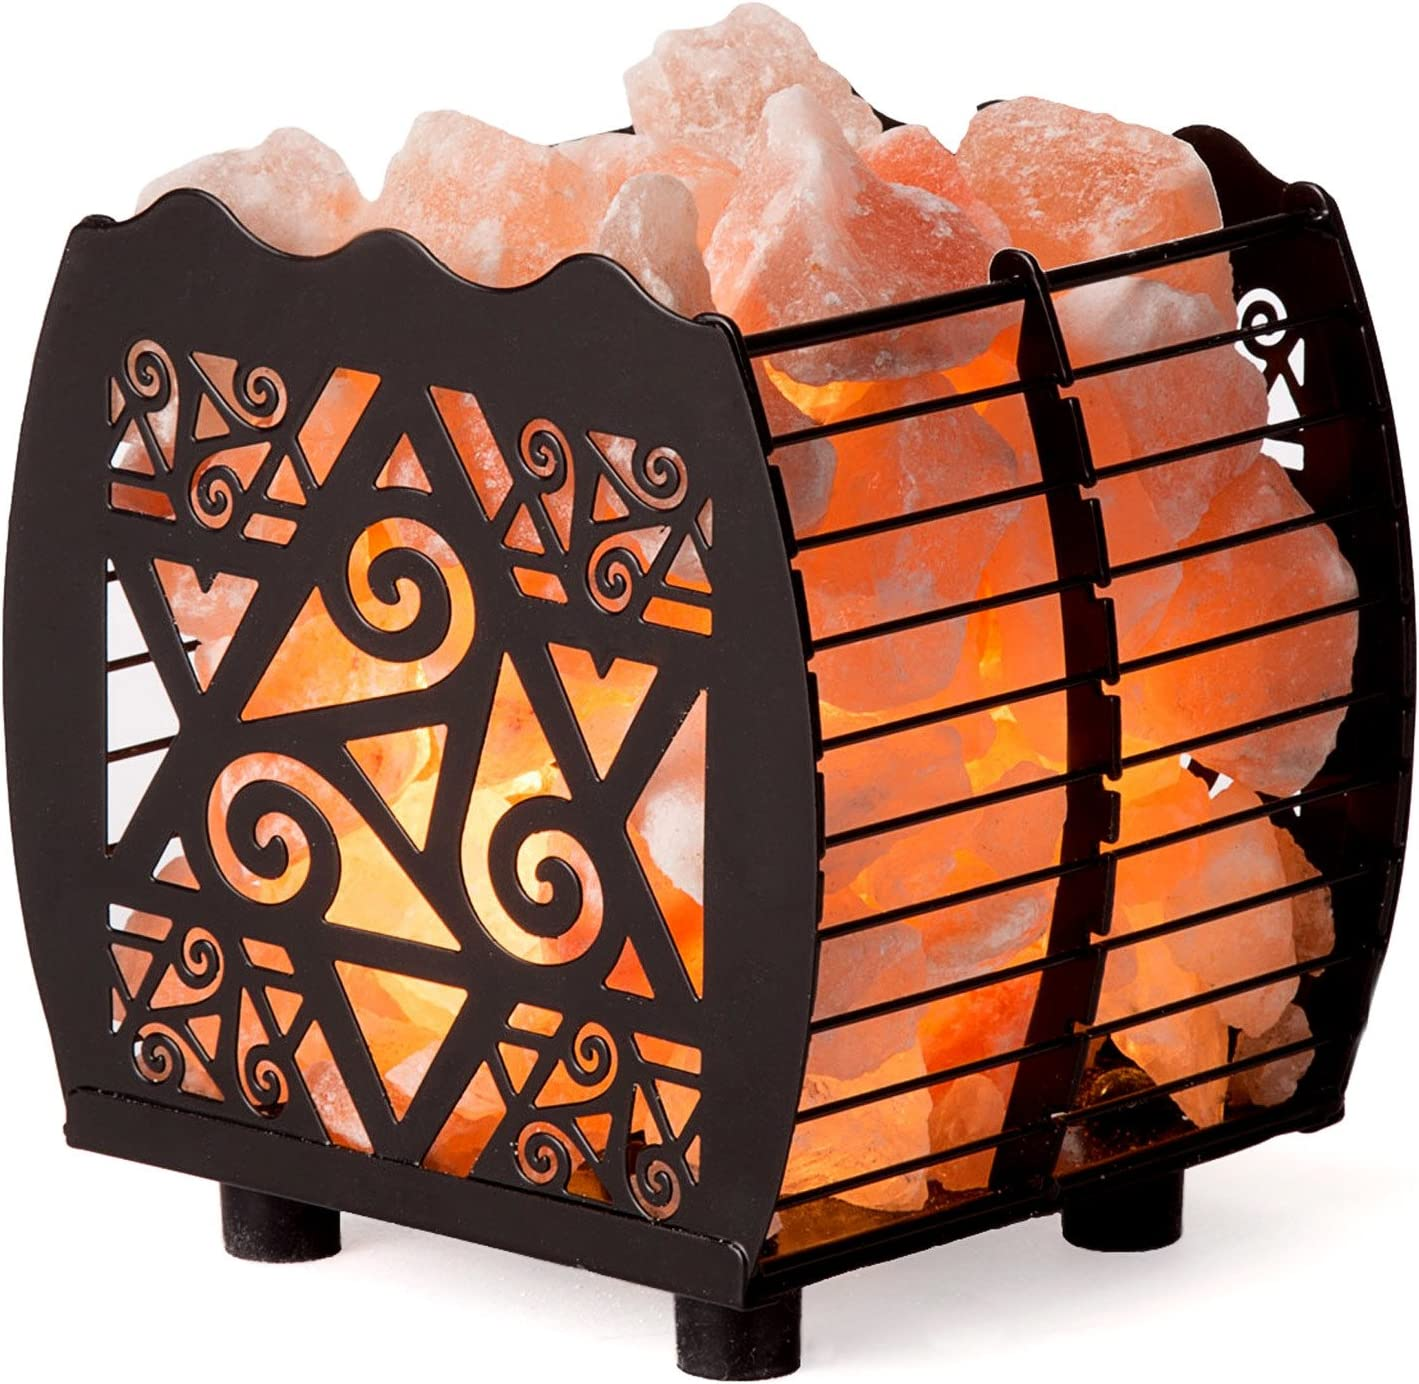 CRYSTAL Super Max 89% OFF special price DECOR Natural Himalayan Salt Lamp with Basket in Metal D